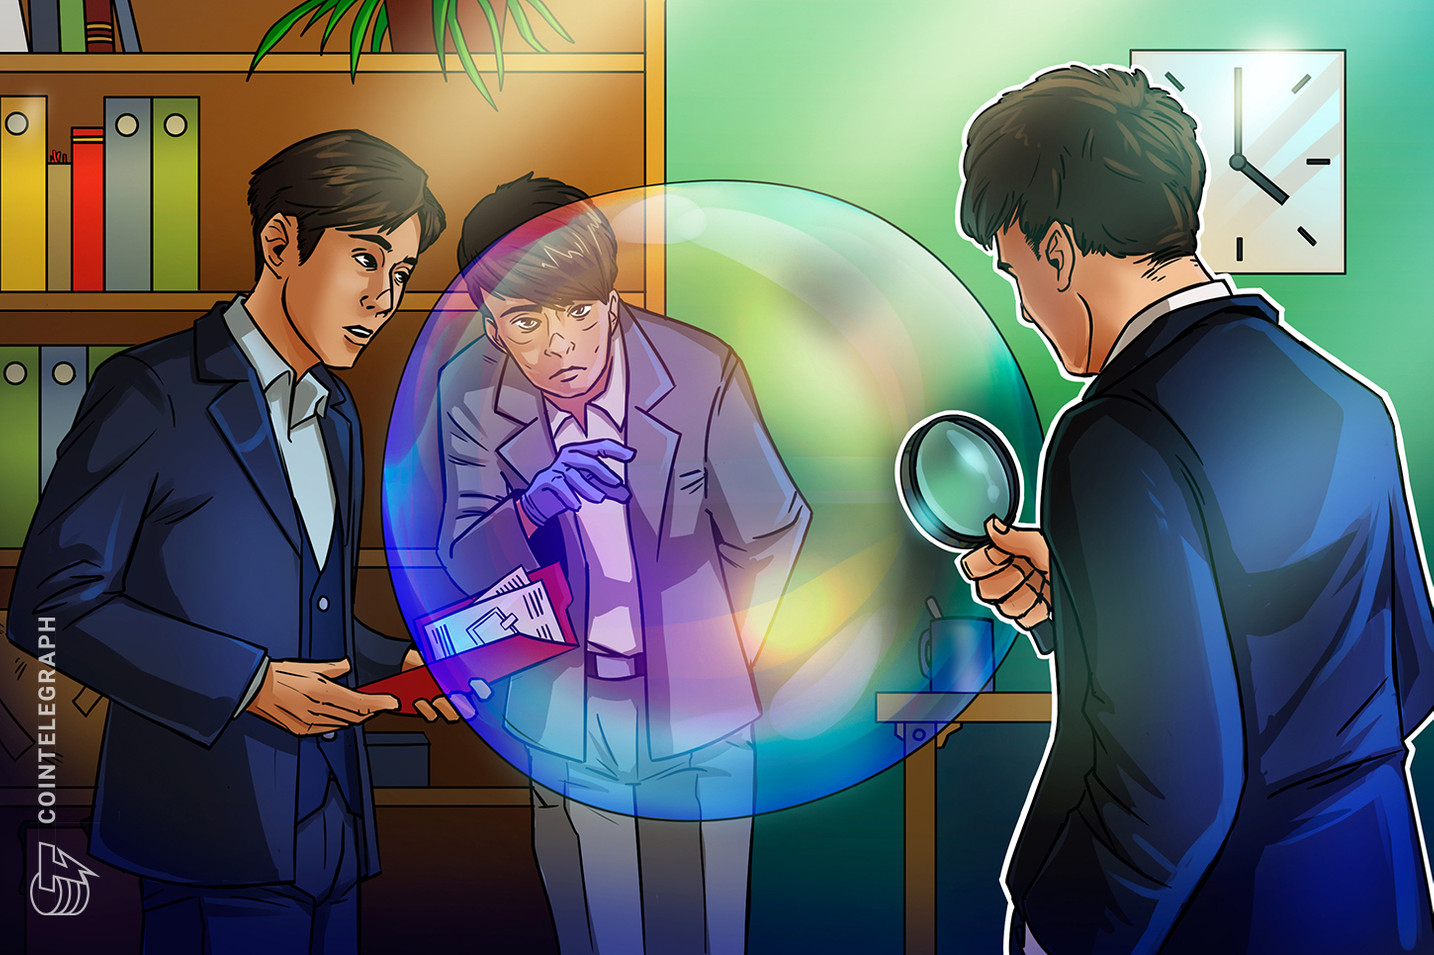 Südkorea: Anleger mit Schneeballsystem betrogen